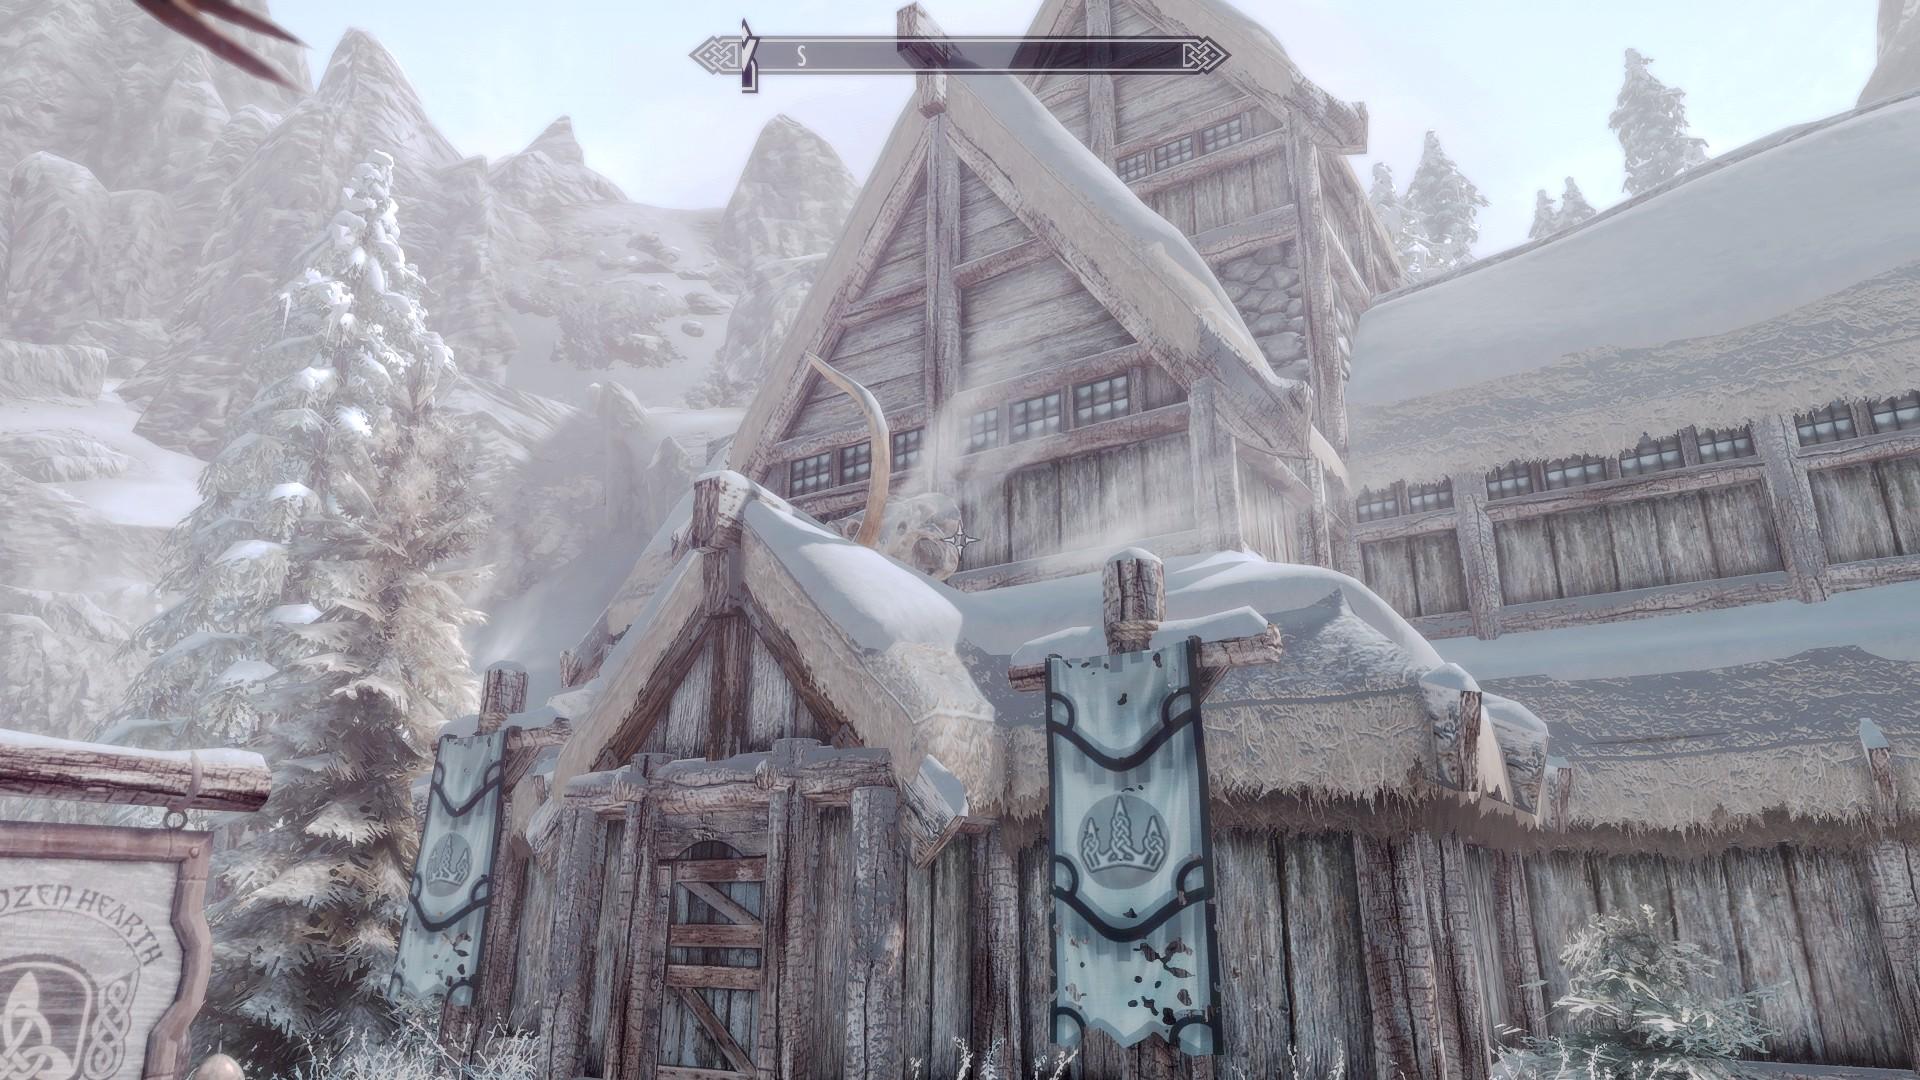 20171002193303_1.jpg - Elder Scrolls 5: Skyrim, the